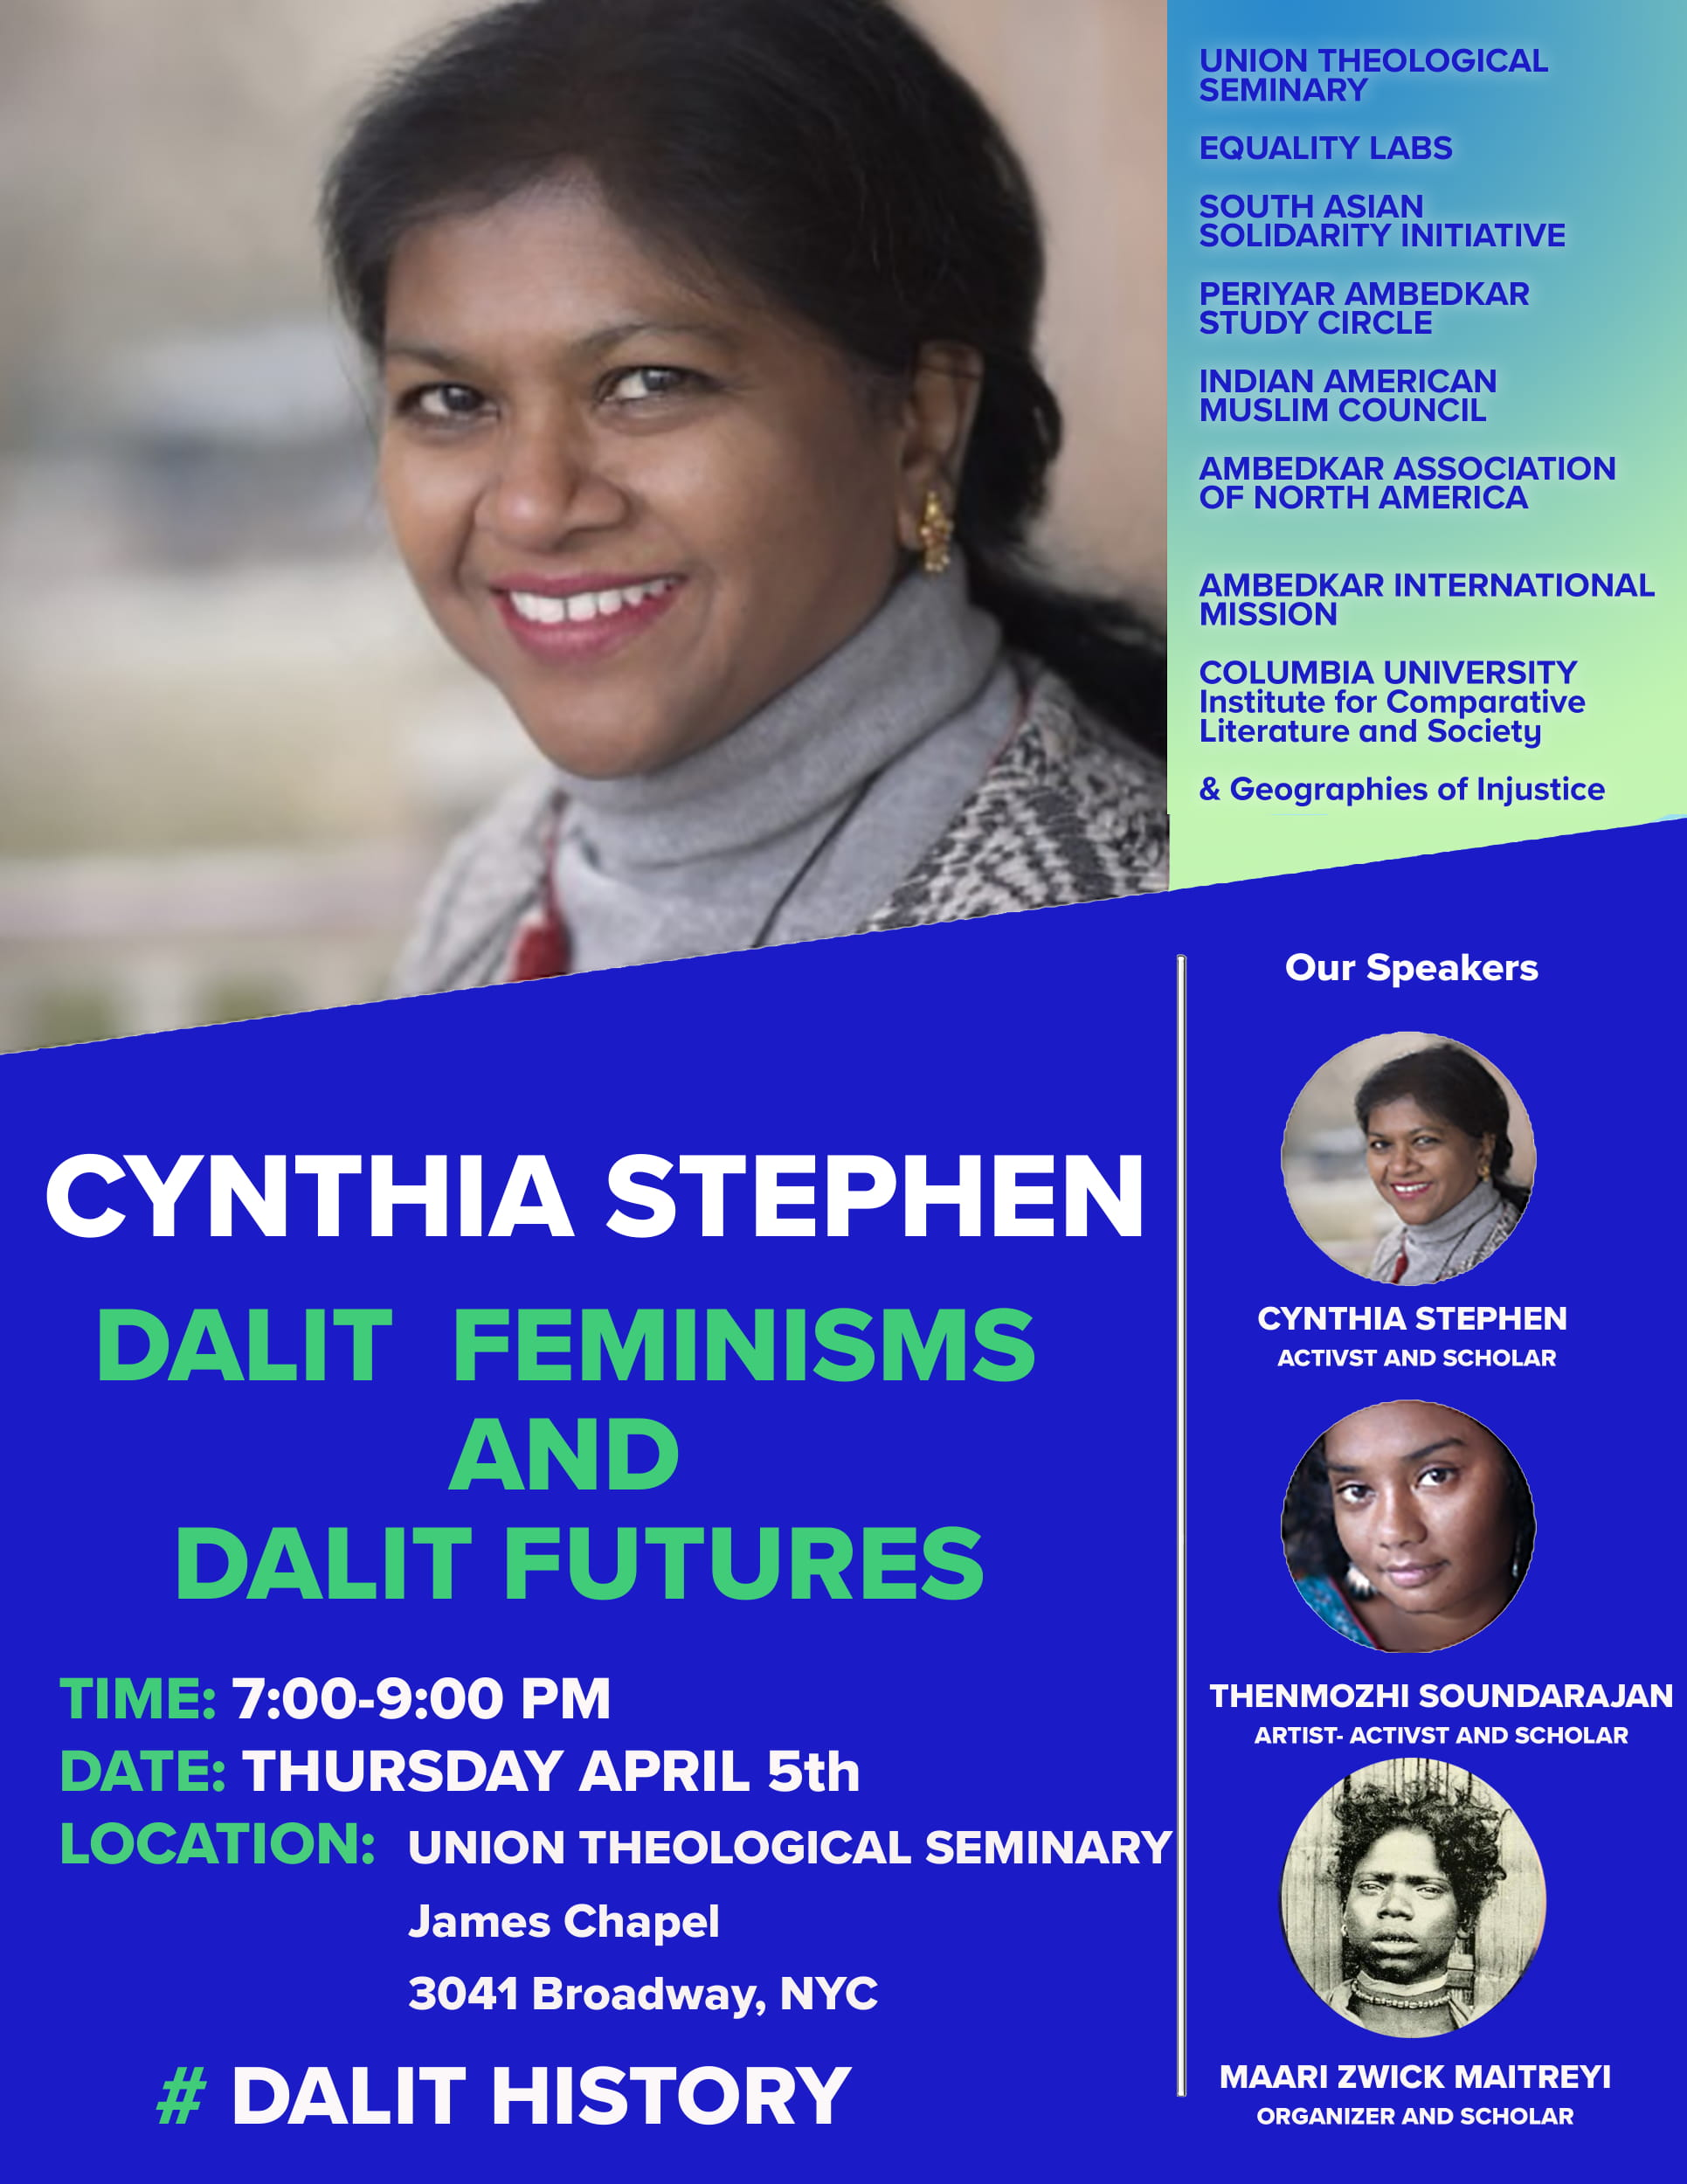 DALITfeminismsandfutures-final-1.jpg